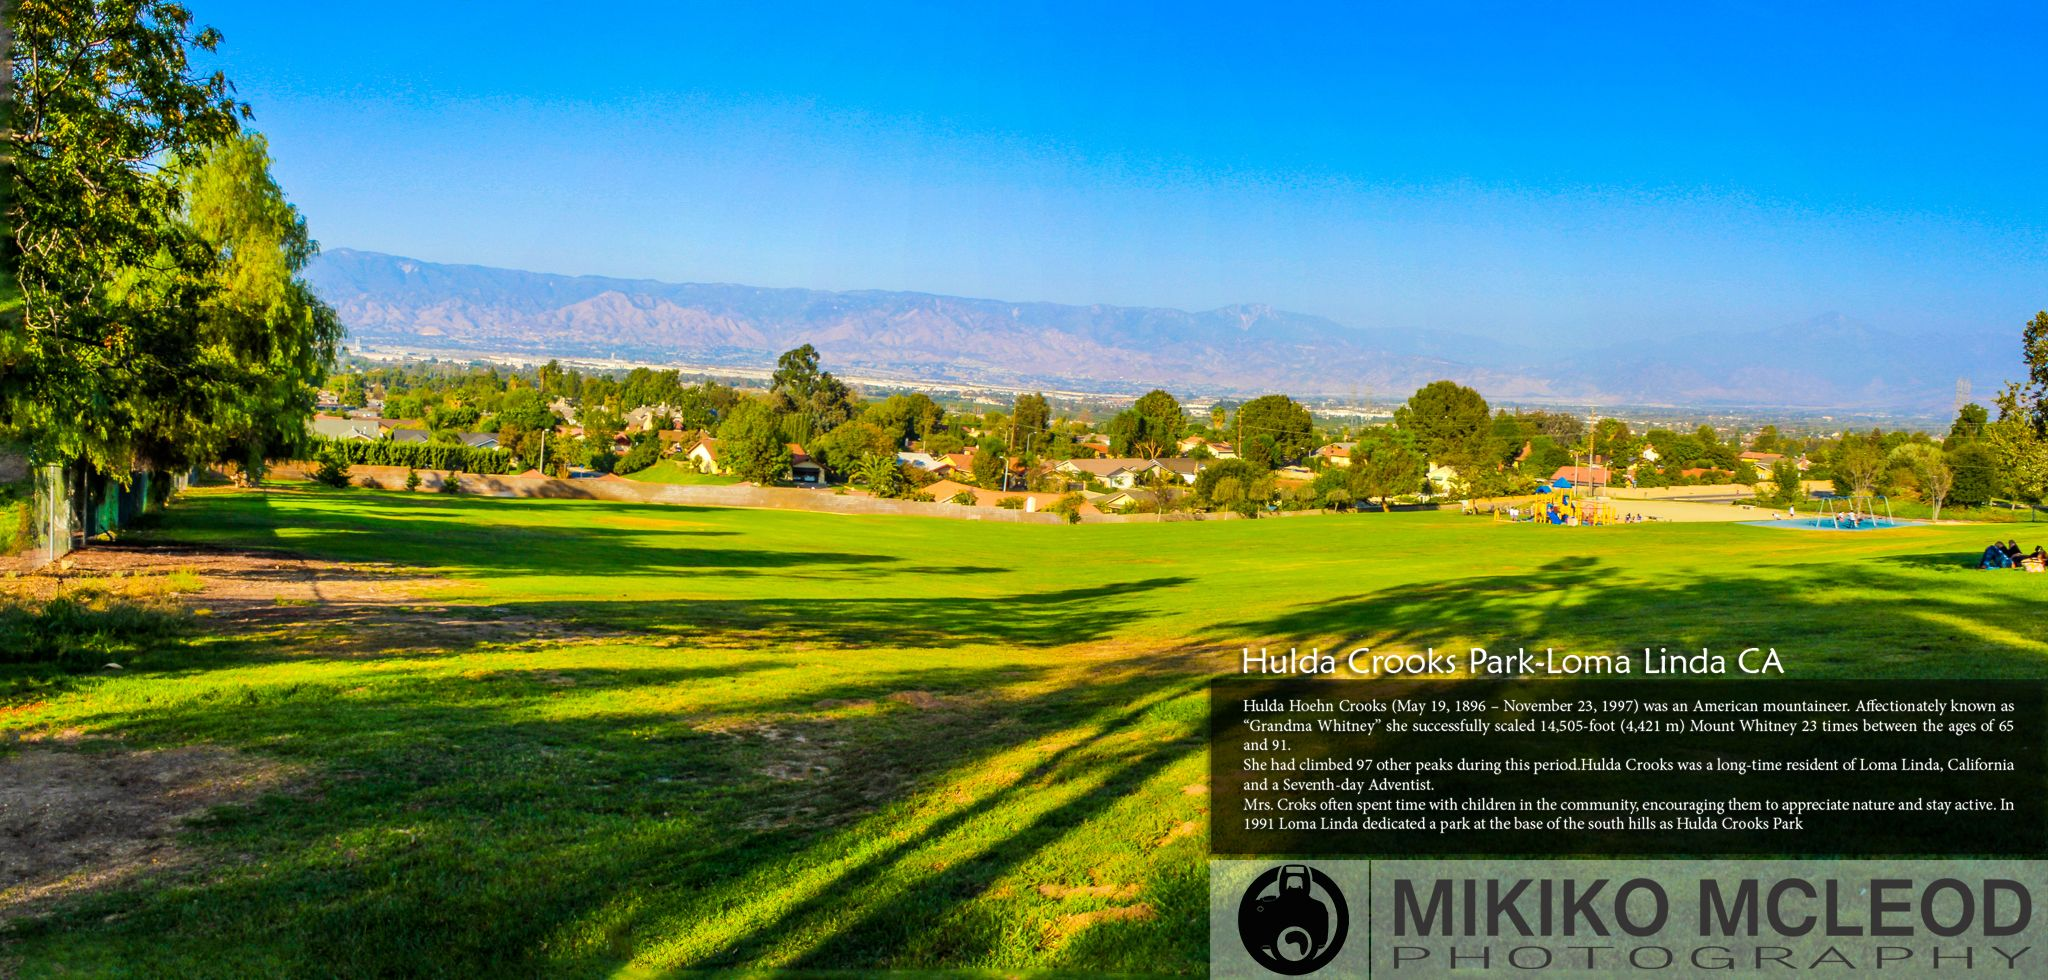 Hulda Crooks Park by Mikiko McLeod | Mikiko Mcleod Photography | Pinterest  | Park and Photography